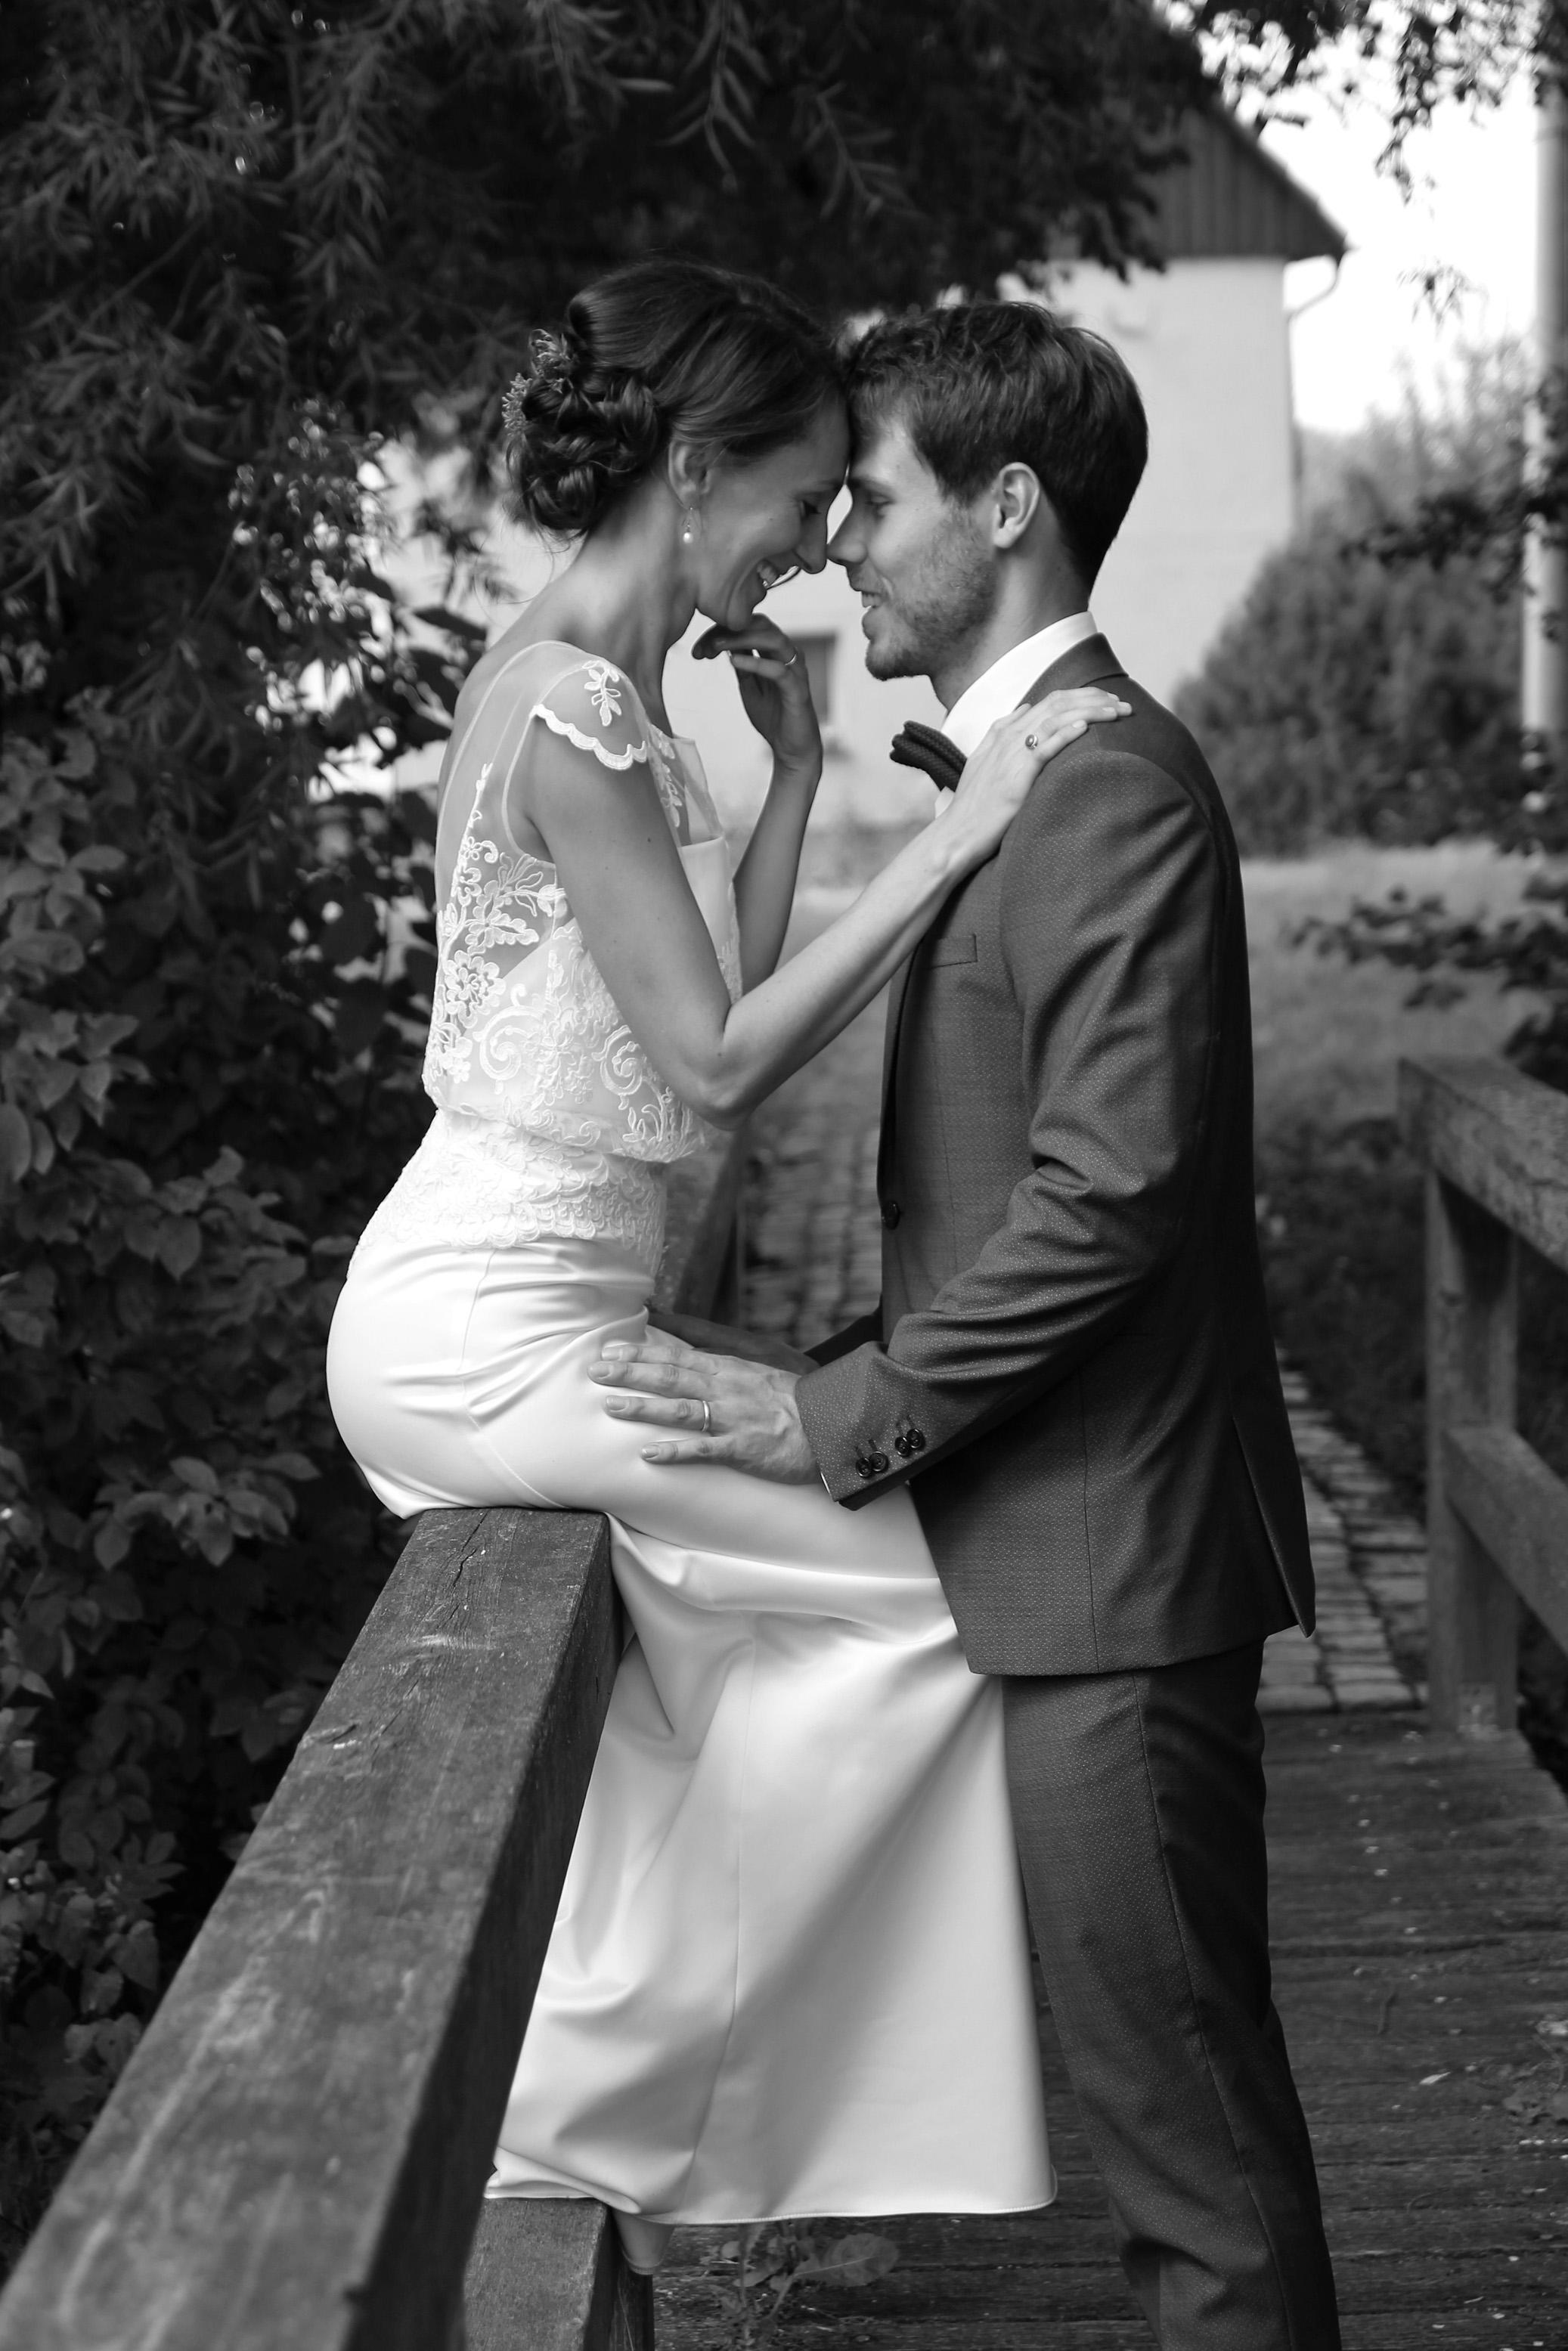 Myrelle_Couture_Marina_Deynega_Hochzeit_Brautmode_kunden3 (7)